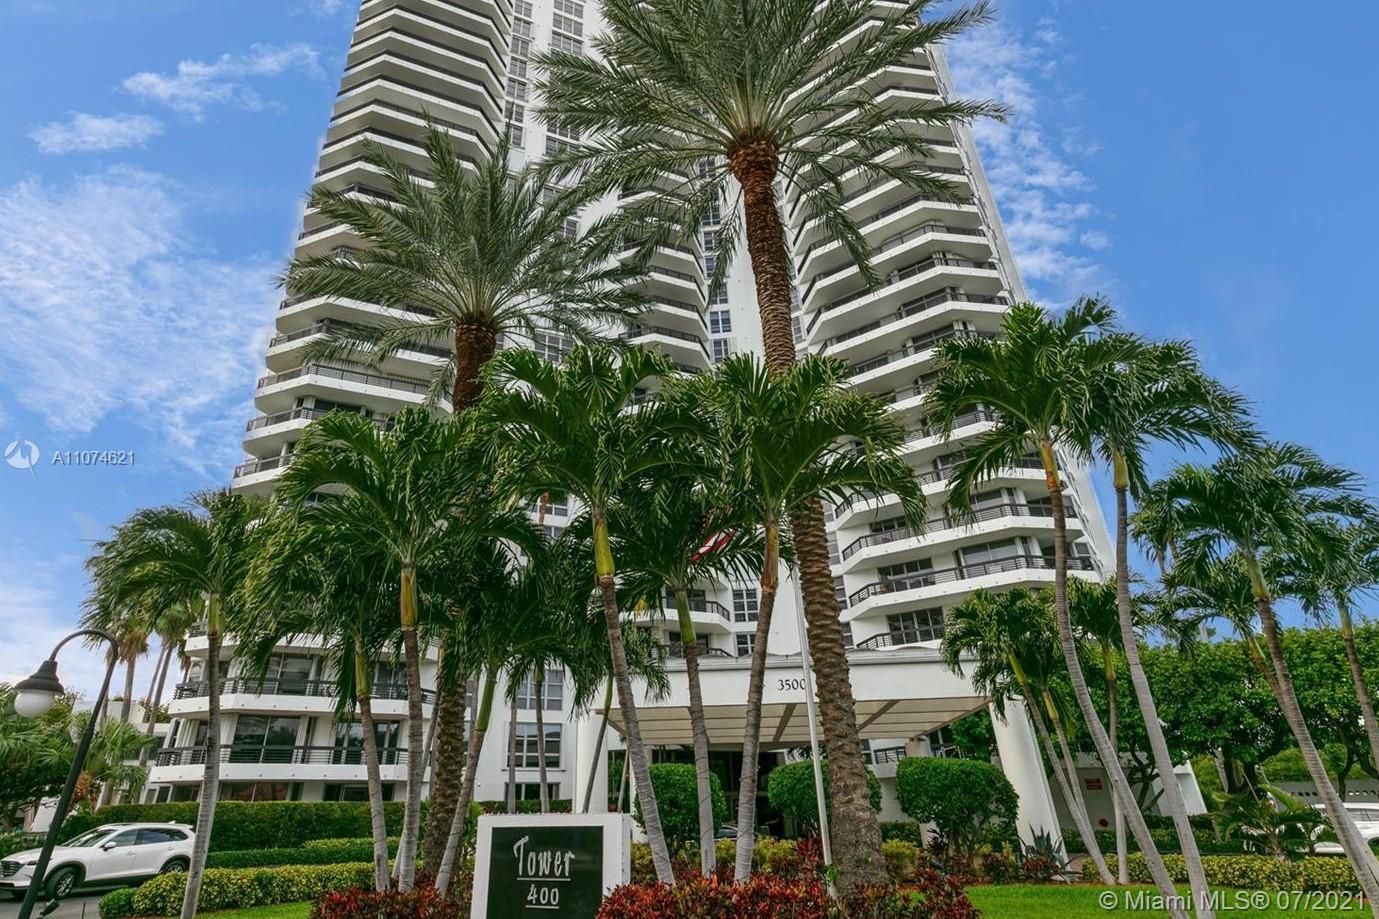 Mystic Pointe Tower 400 #1504 - 3500 Mystic Pointe Dr #1504, Aventura, FL 33180